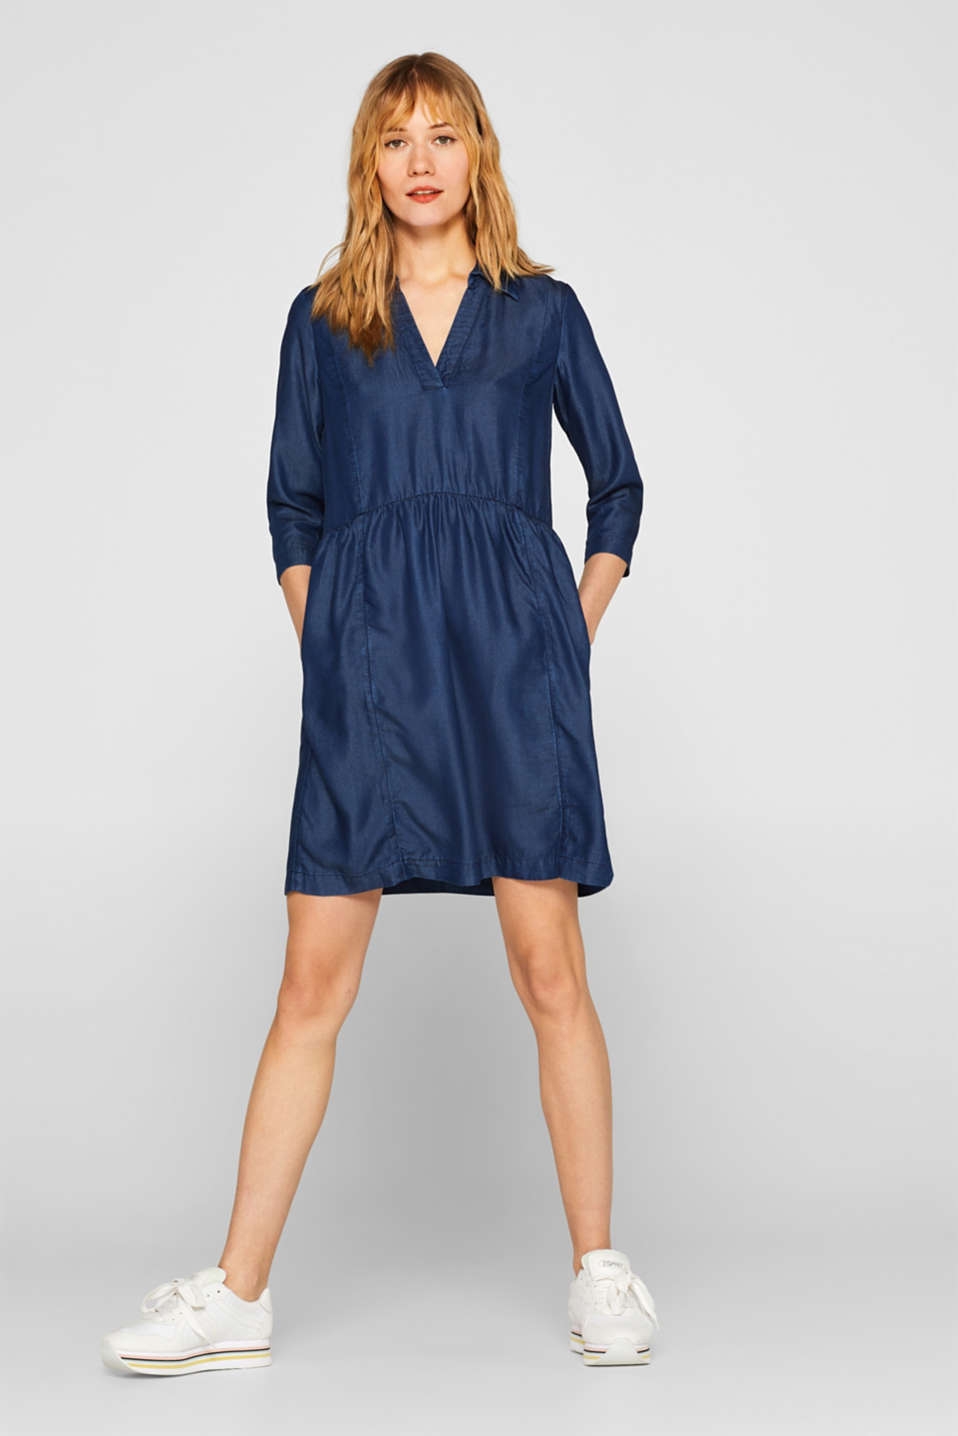 Denim-effect TENCEL™ dress